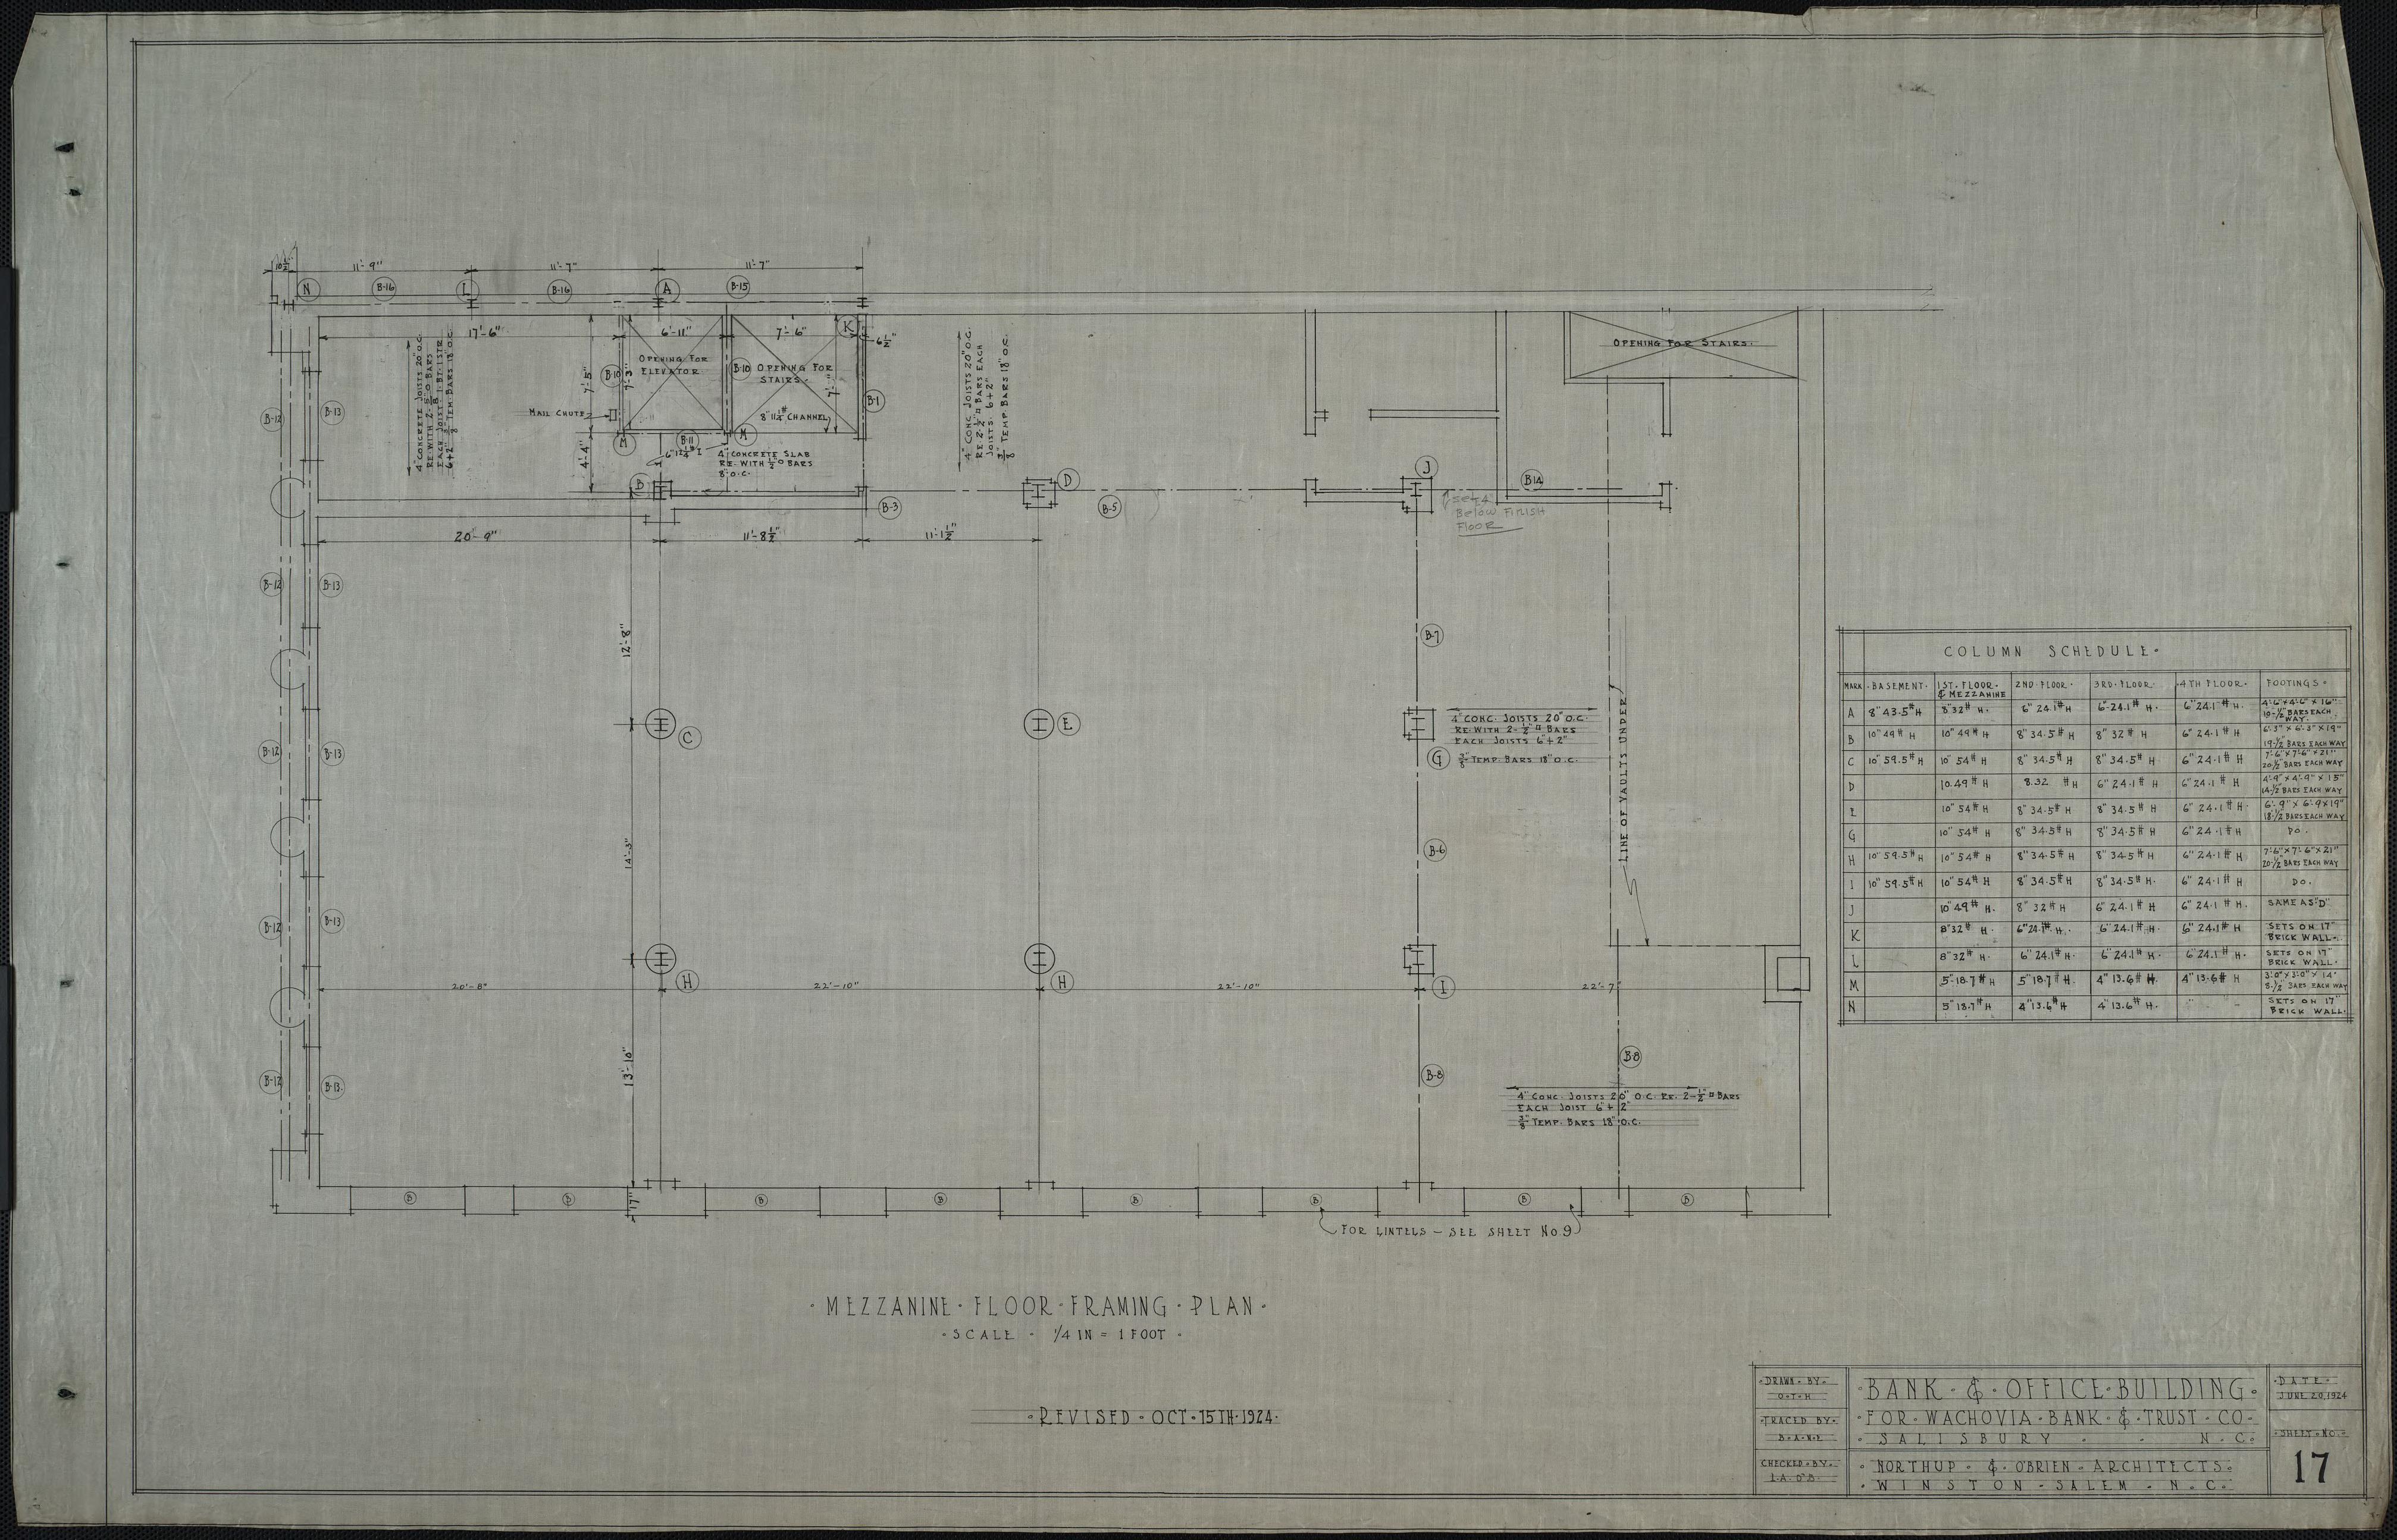 Mezzanine floor framing plan wachovia bank and office for Mezzanine floor construction details